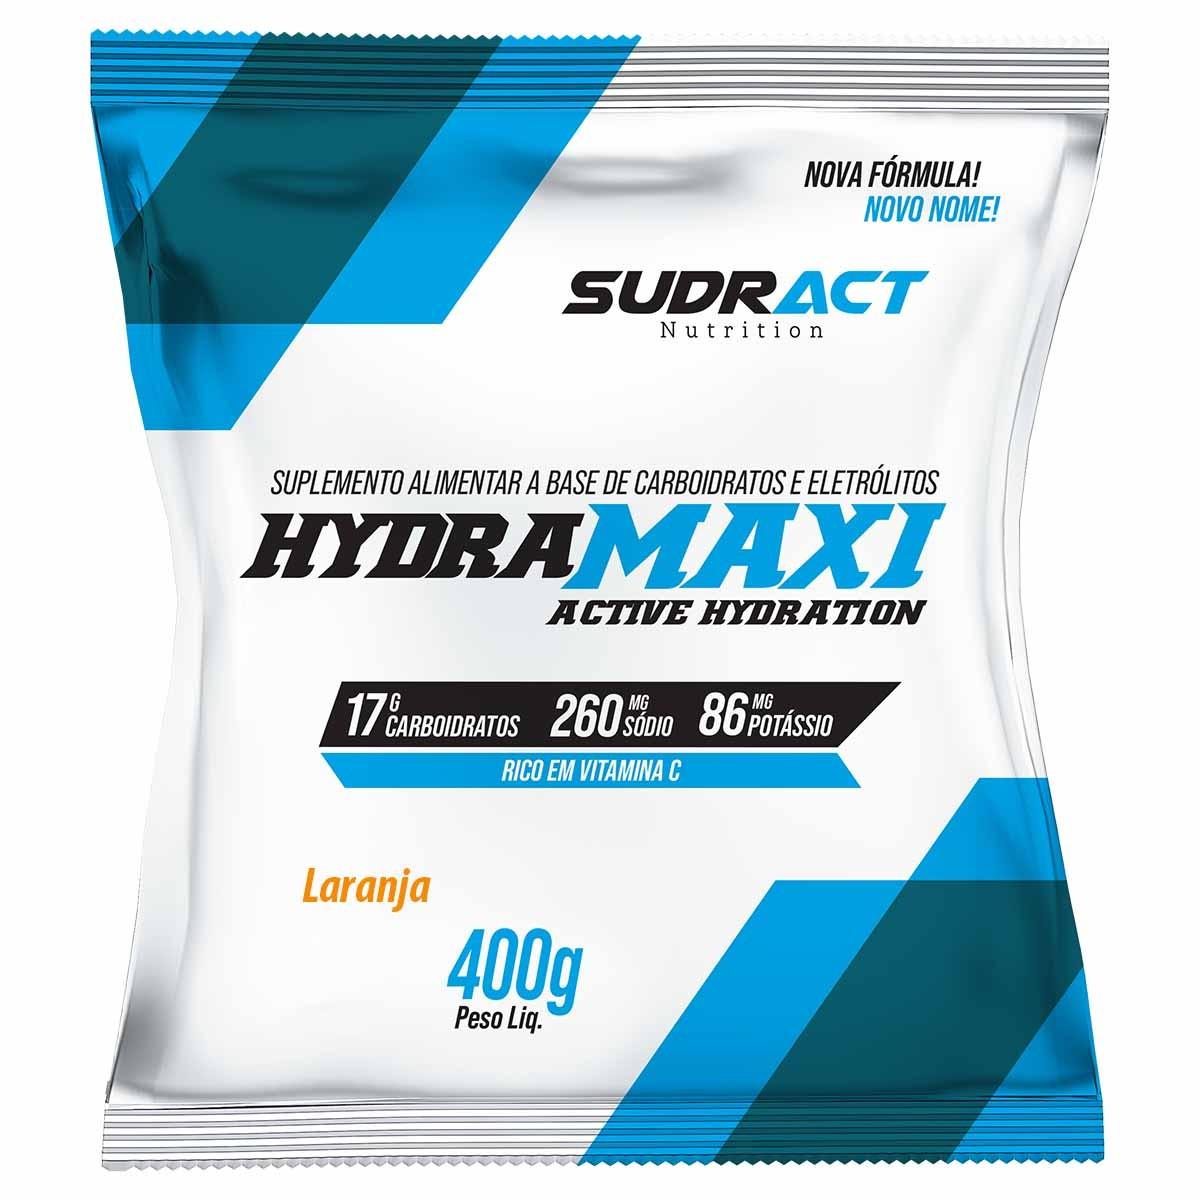 Isotônico Hydramaxi 400g - Sudract